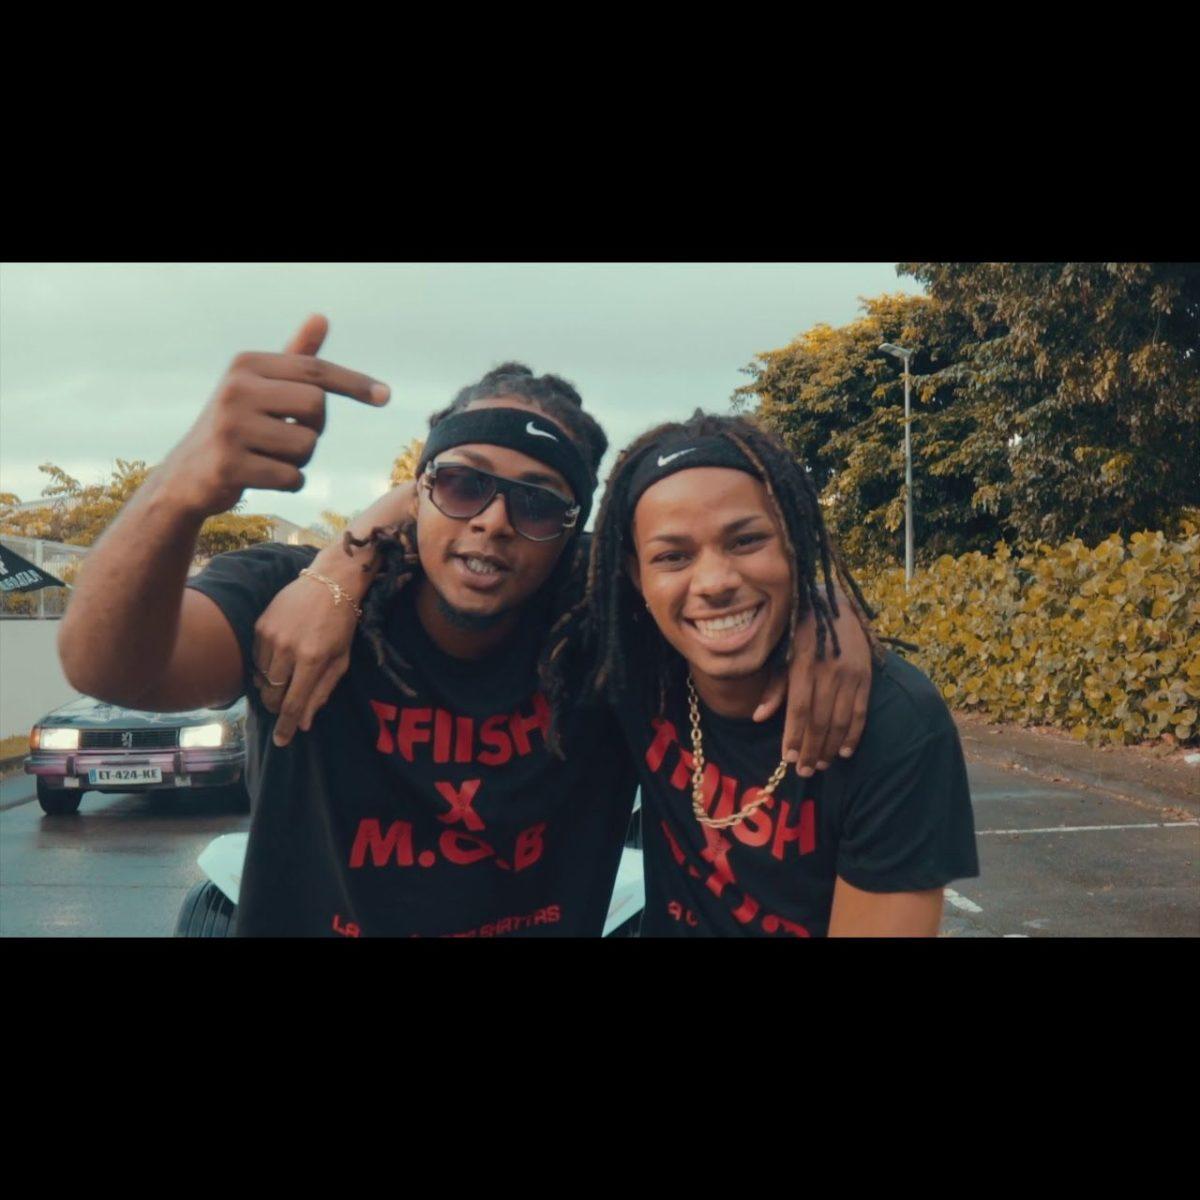 M.O.B and DJ Tfiish - La choré des shattas (Thumbnail)